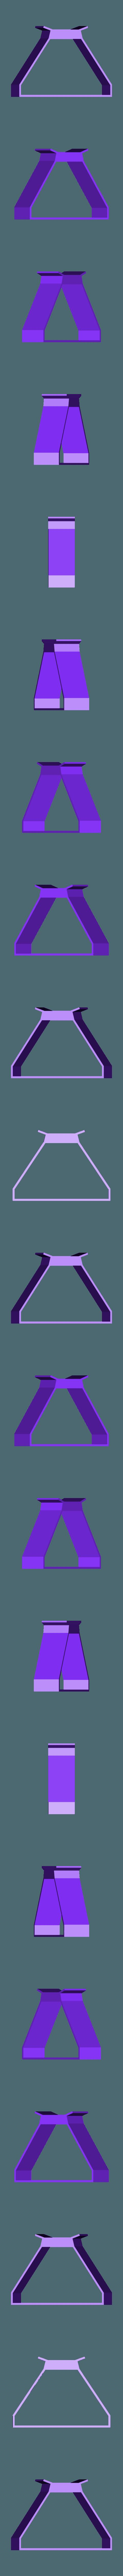 picus lamp3 by ctrl design.stl Download free STL file LED LIGHT • 3D printer model, Byctrldesign